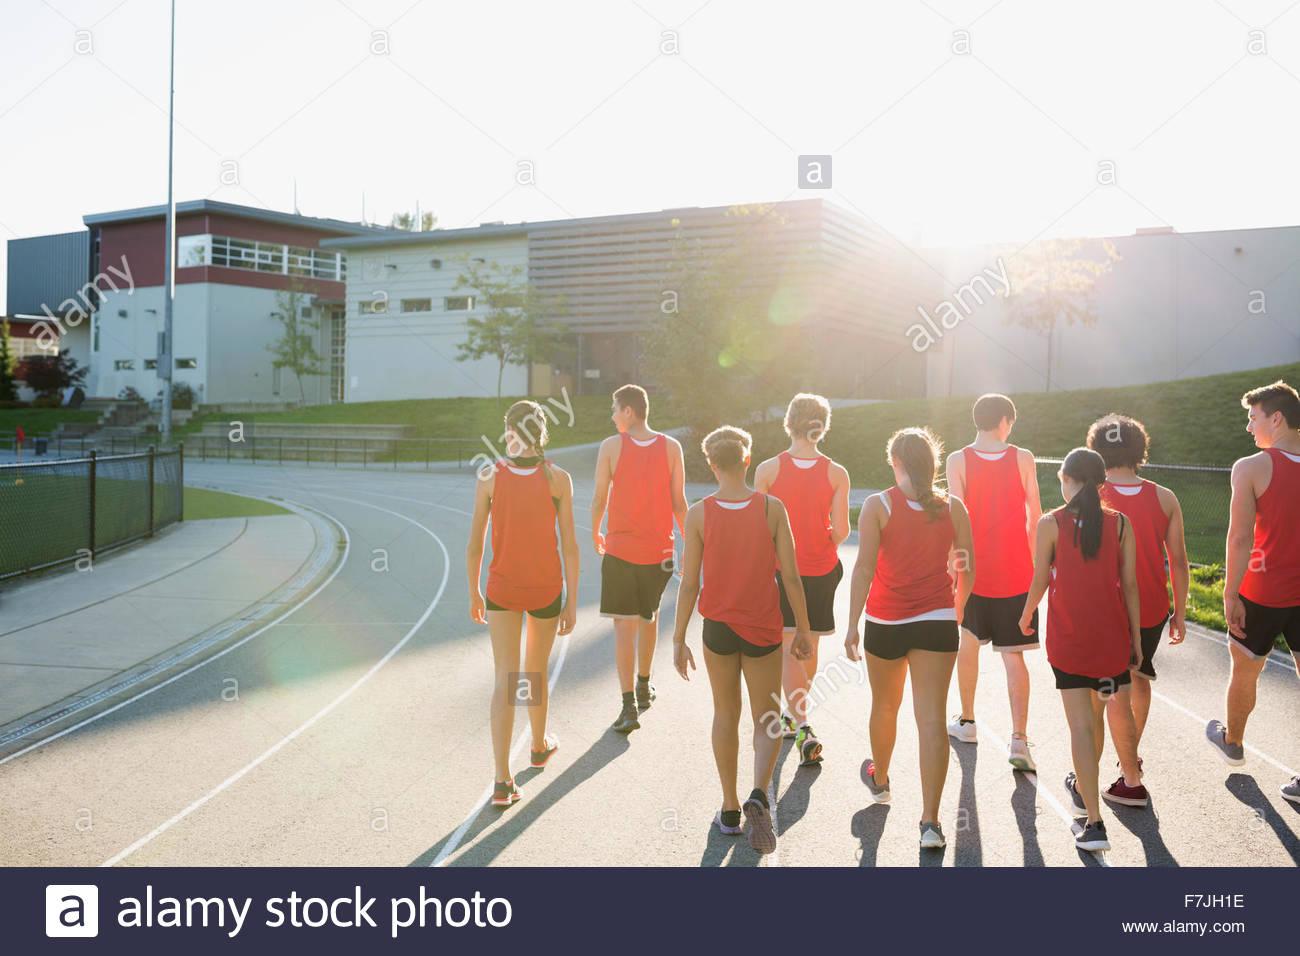 High School Leichtathletik Team Laufstrecke Stockbild